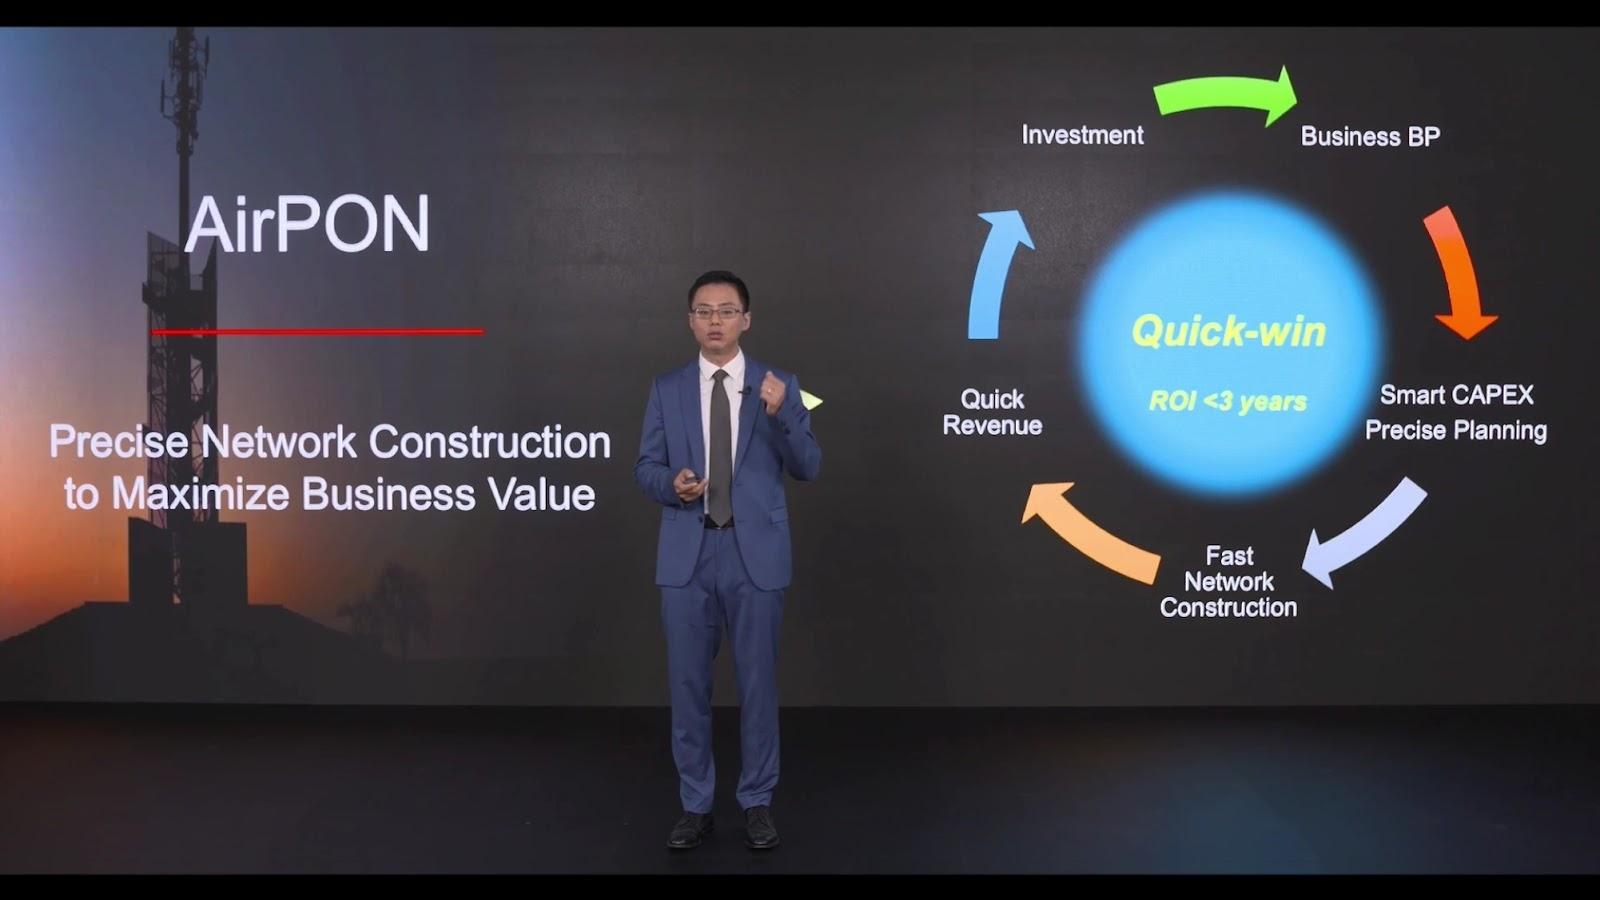 Huawei เปิดตัวโซลูชัน AirPON สำหรับการใช้งานเชิงพาณิชย์ส่งมอบการเข้าถึง Fixed-Mobile Convergence อย่างรวดเร็วและง่ายดาย